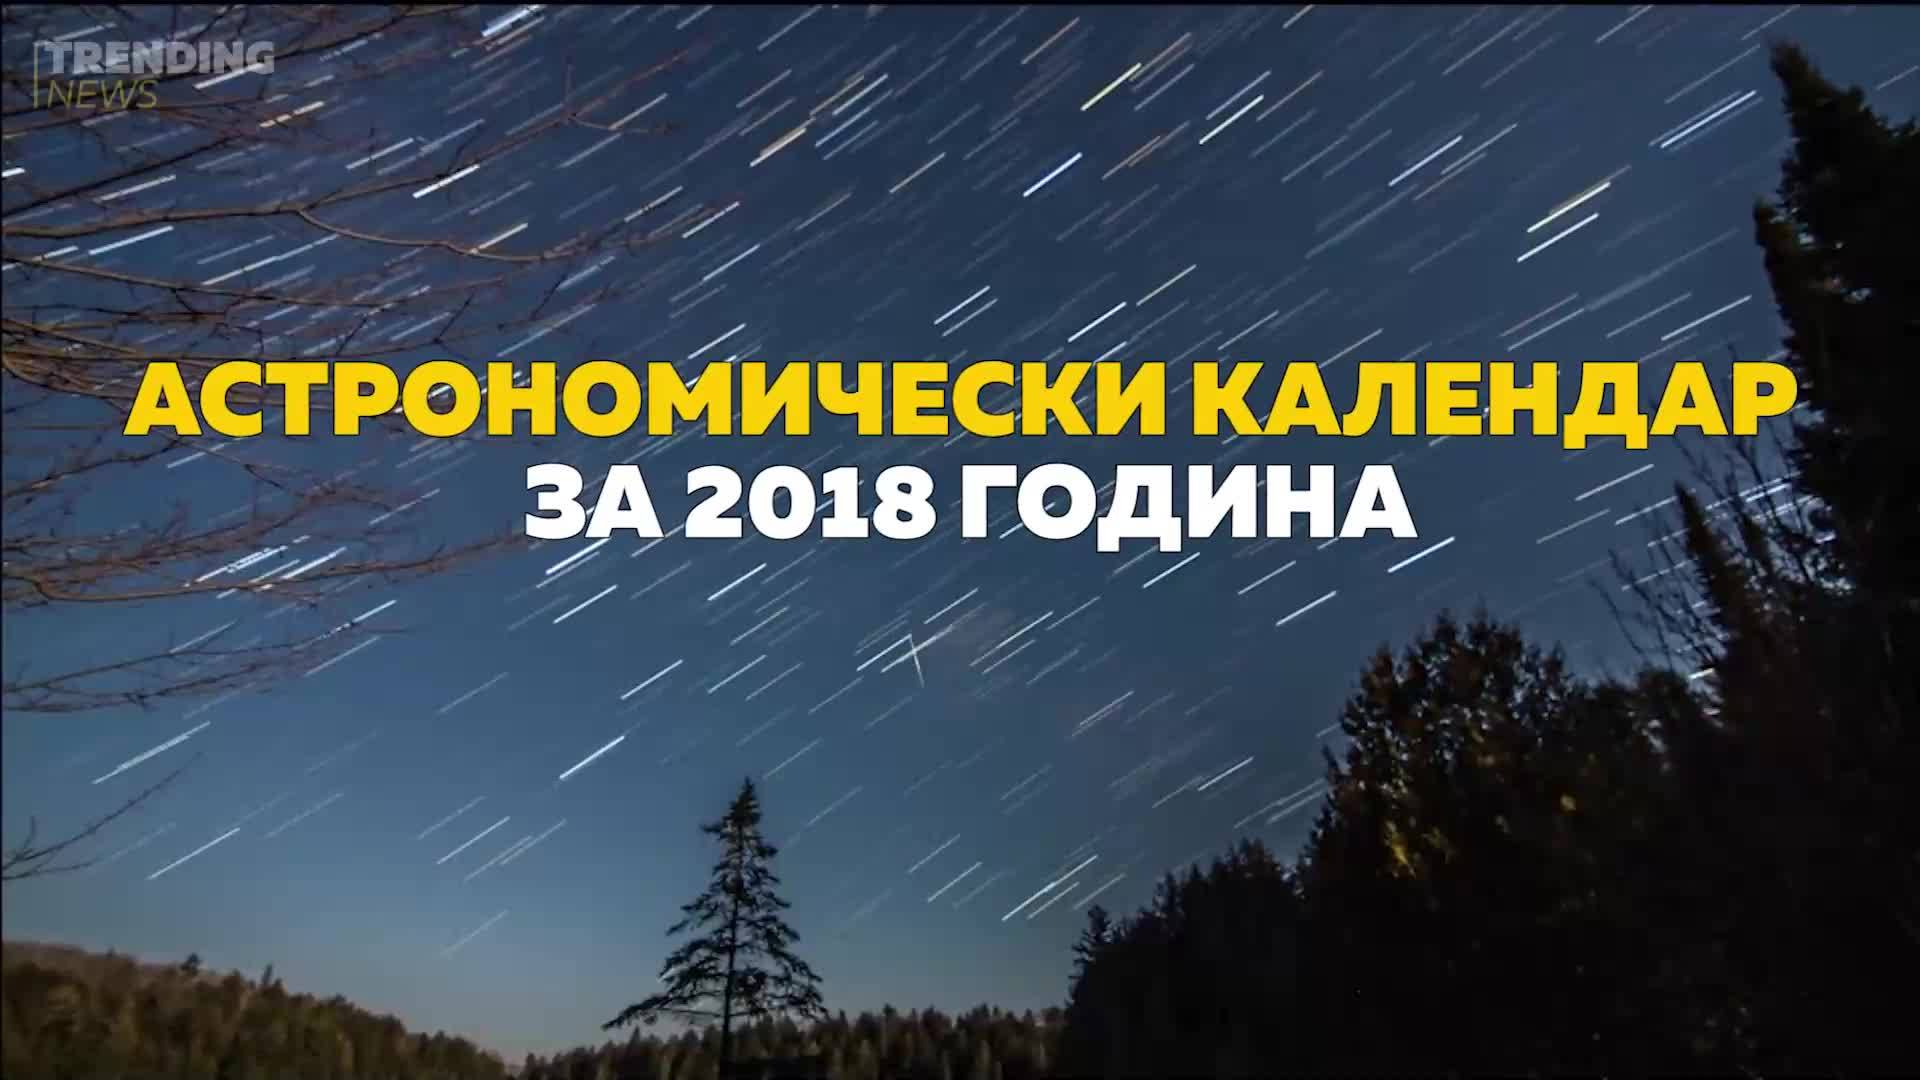 Астрономически календар за 2018-та